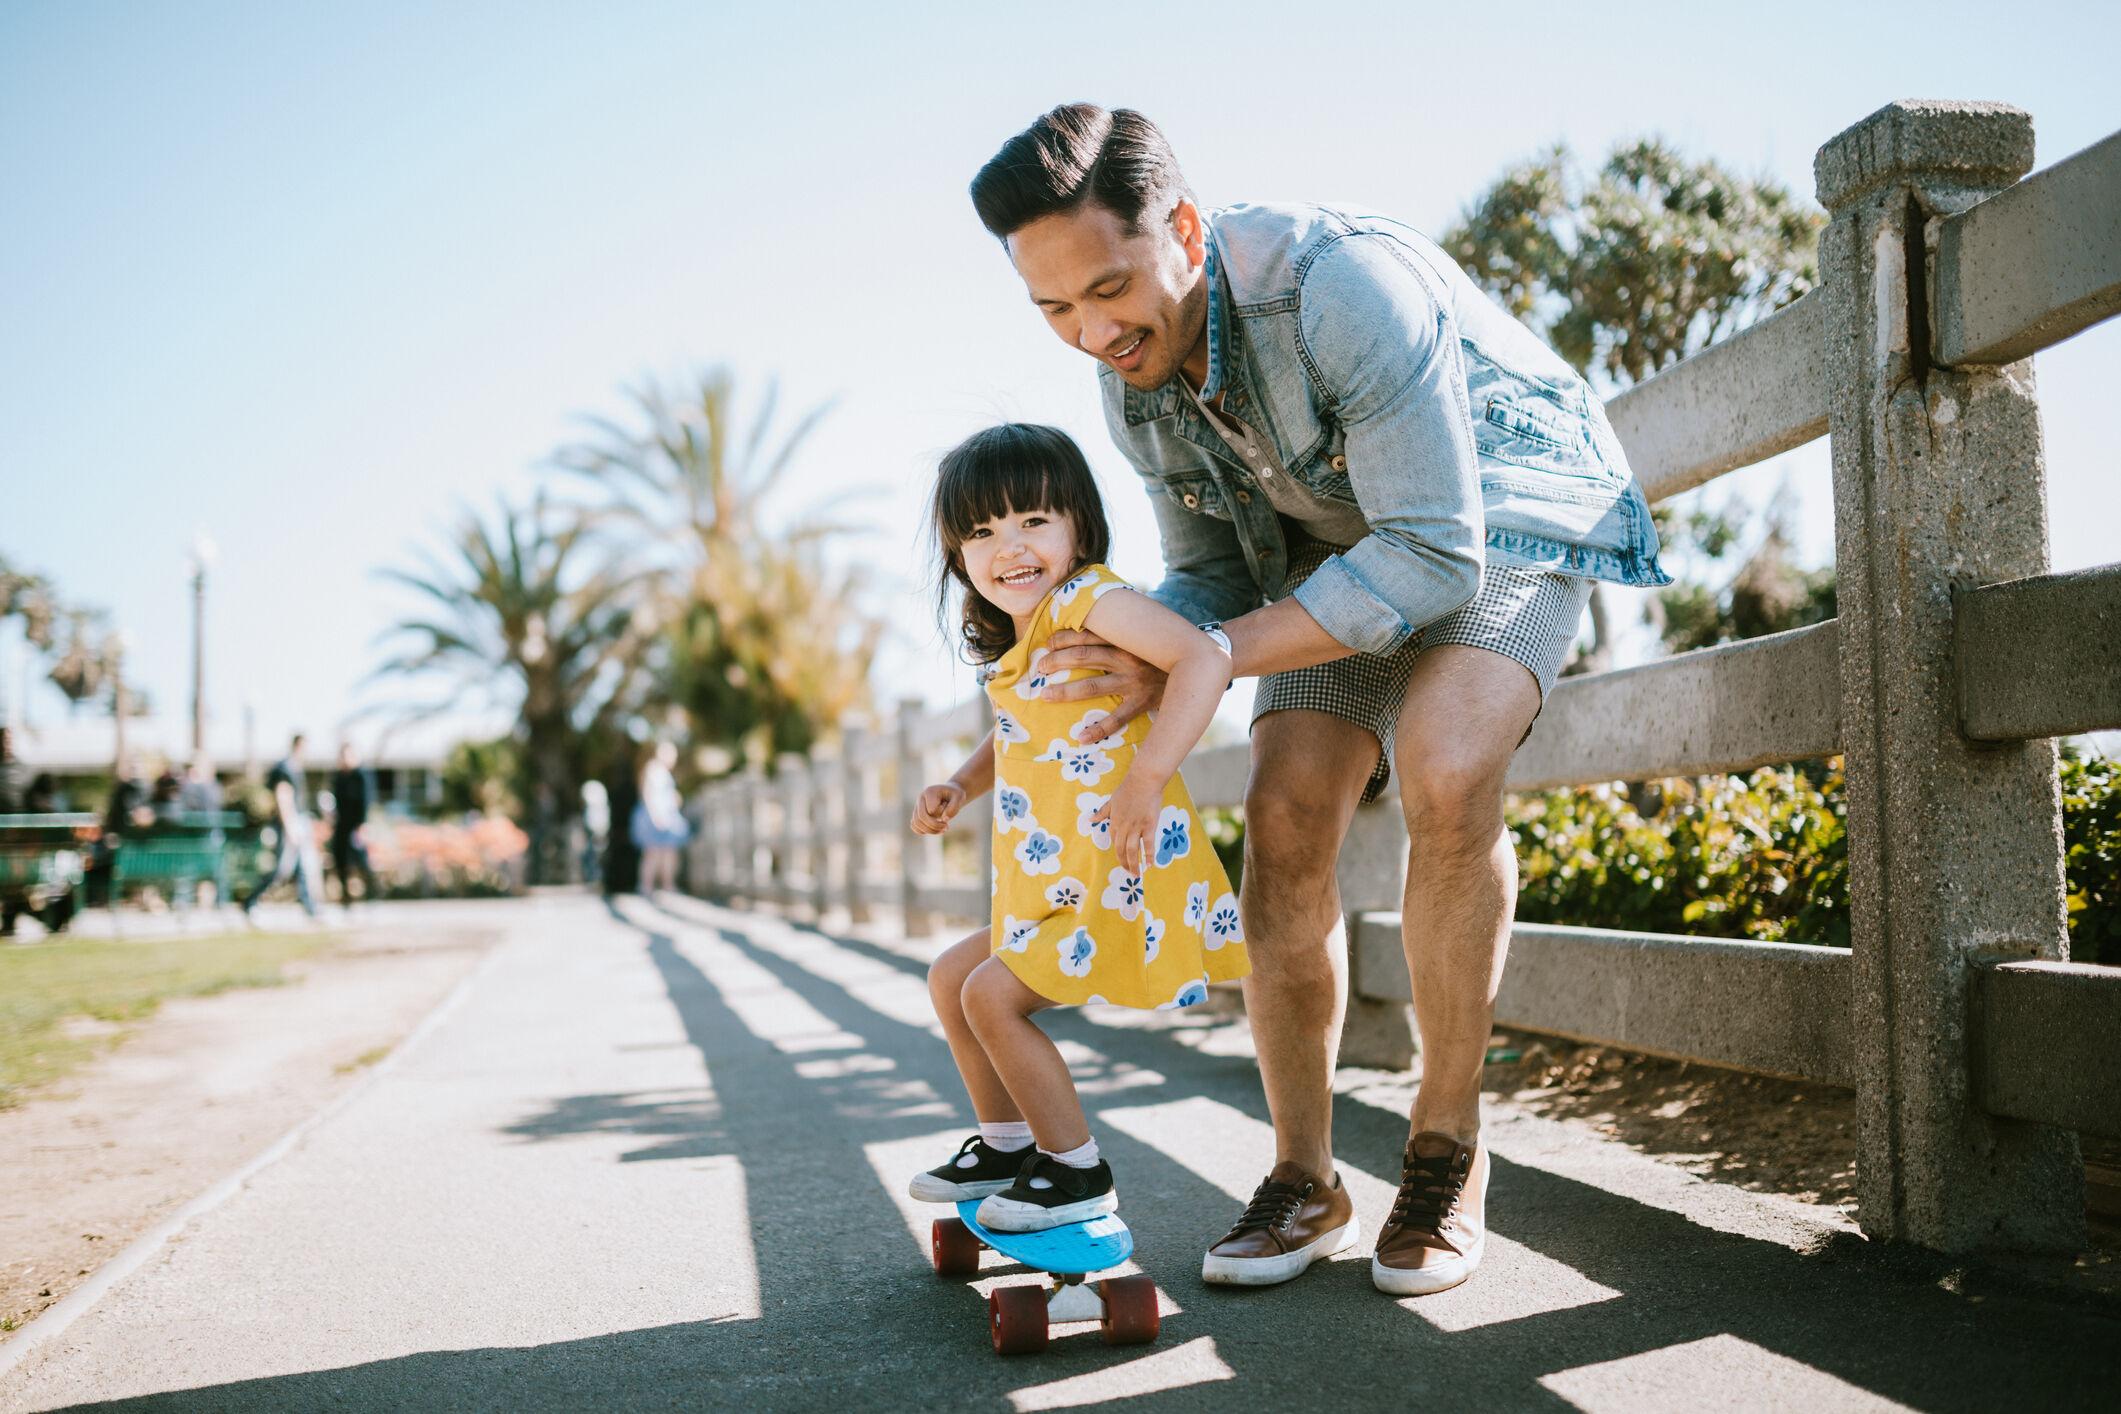 crianca-pequena-andando-de-skate